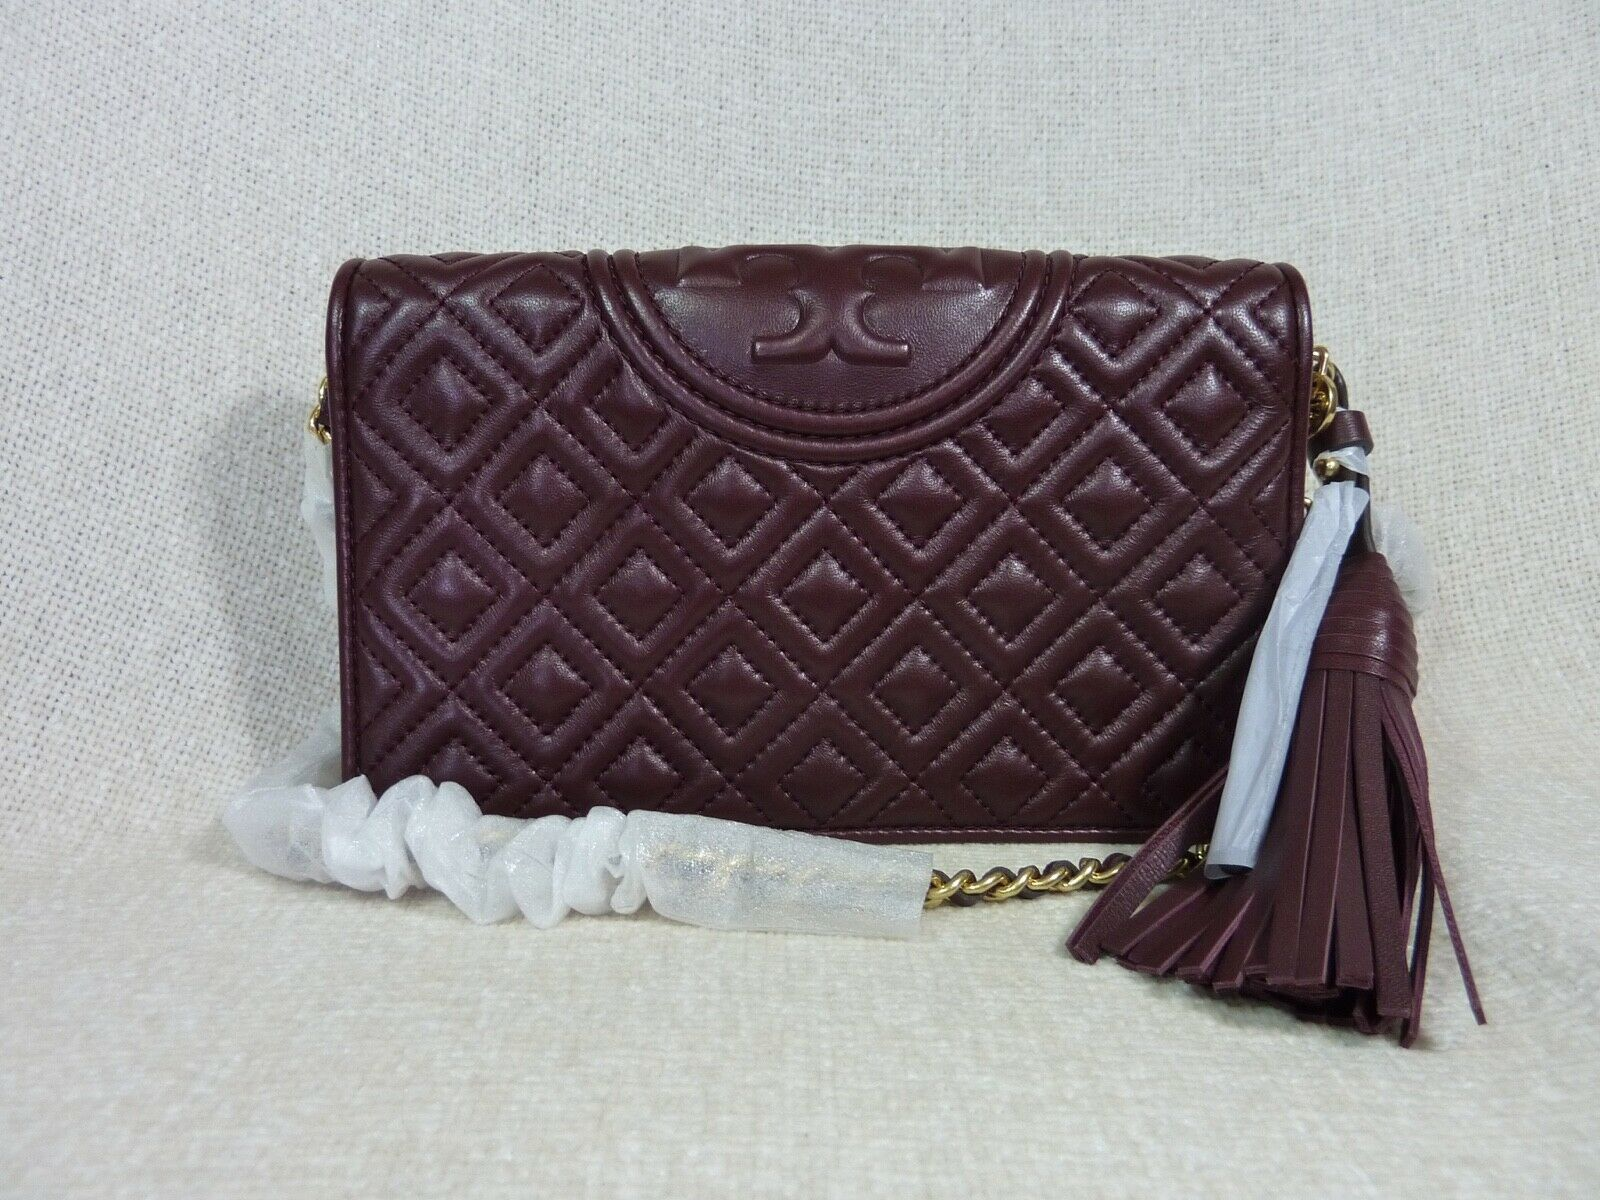 NWT Tory Burch Claret Fleming Wallet Cross Body Bag $328